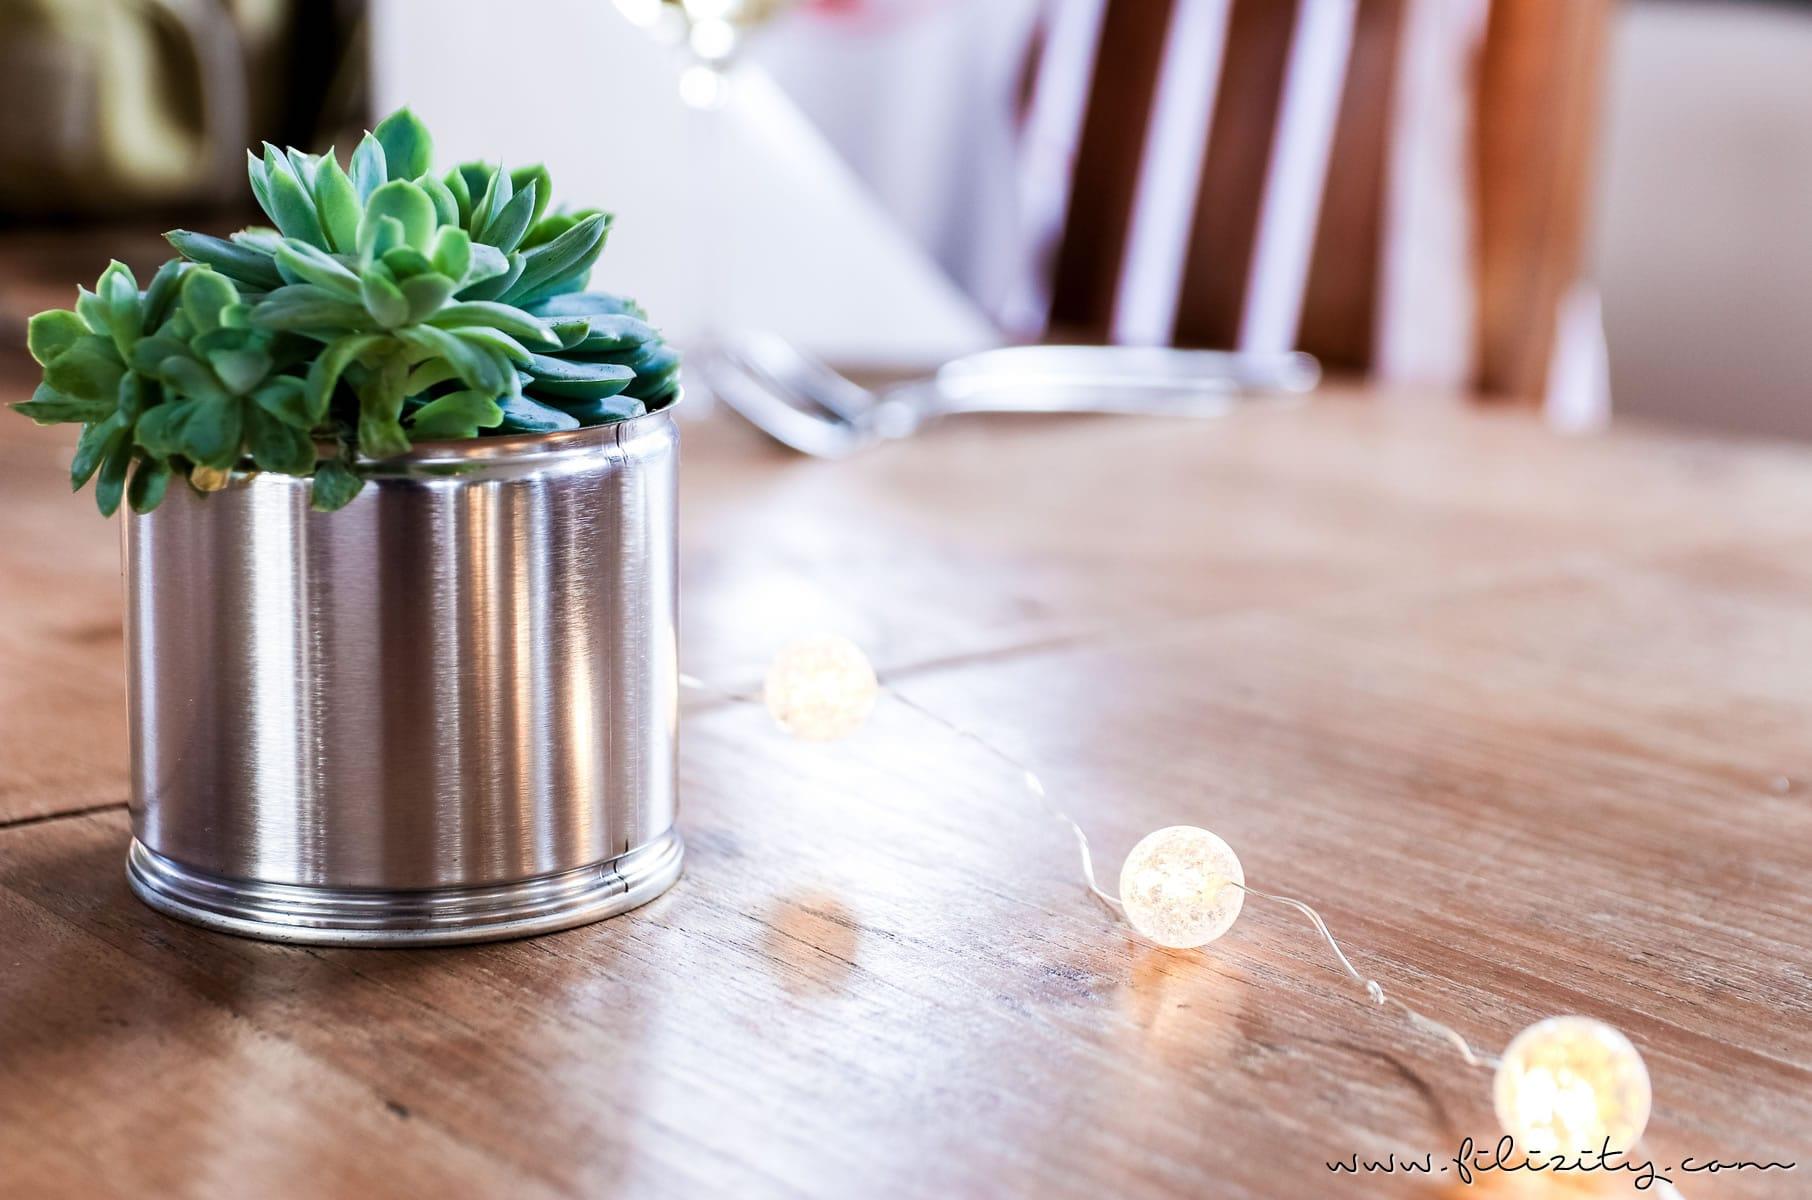 #CANNYCHRISTMAS - Blogger-Event der Initiative Lebensmitteldose | Filizity.com | Lifestyle-Blog aus dem Rheinland